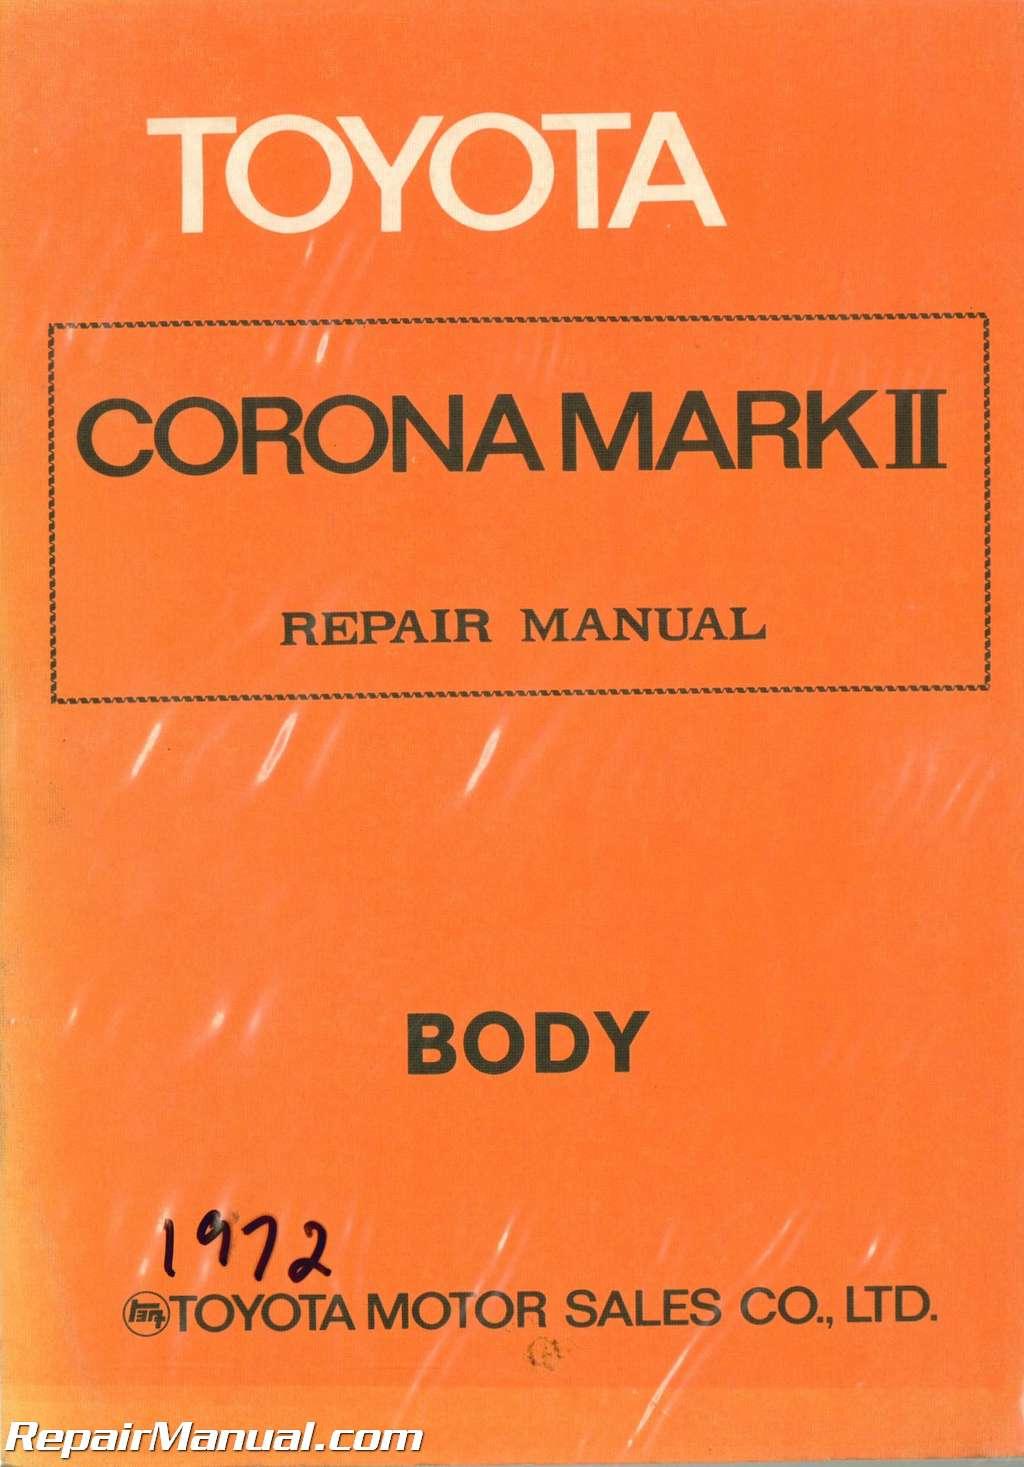 Used 1972 Toyota Corona Mark Ii Body Group Repair Manual